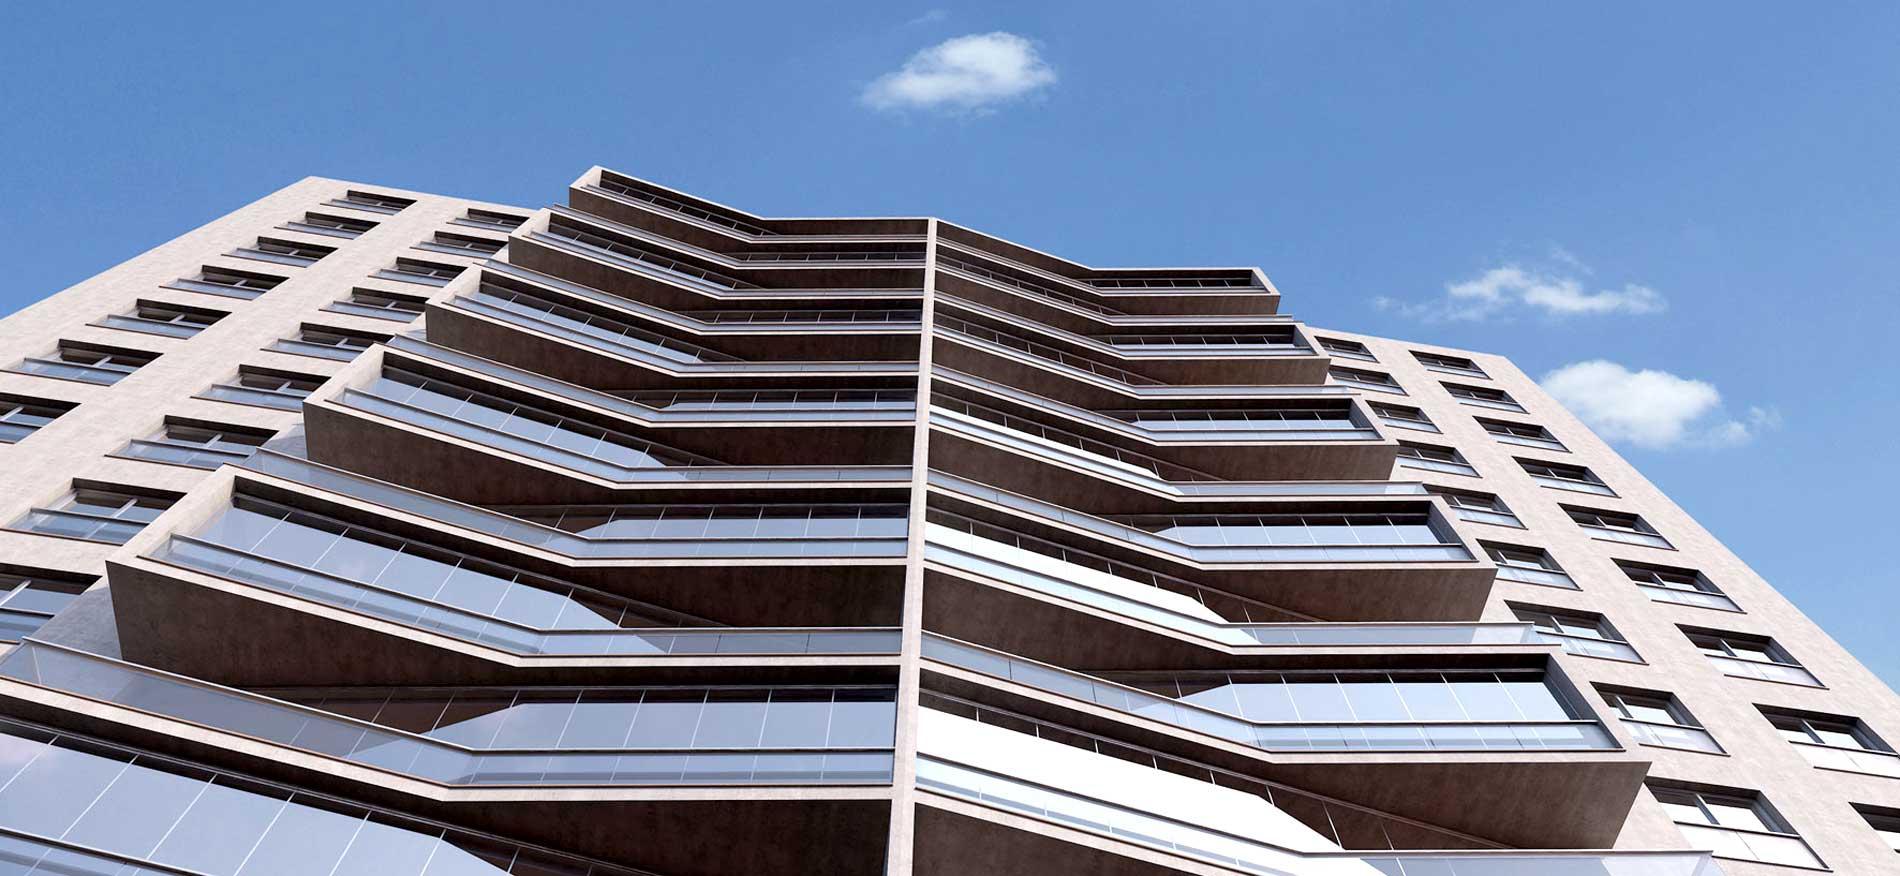 Cristales para terrazas en malaga cerramientos - Cristaleras para terrazas ...